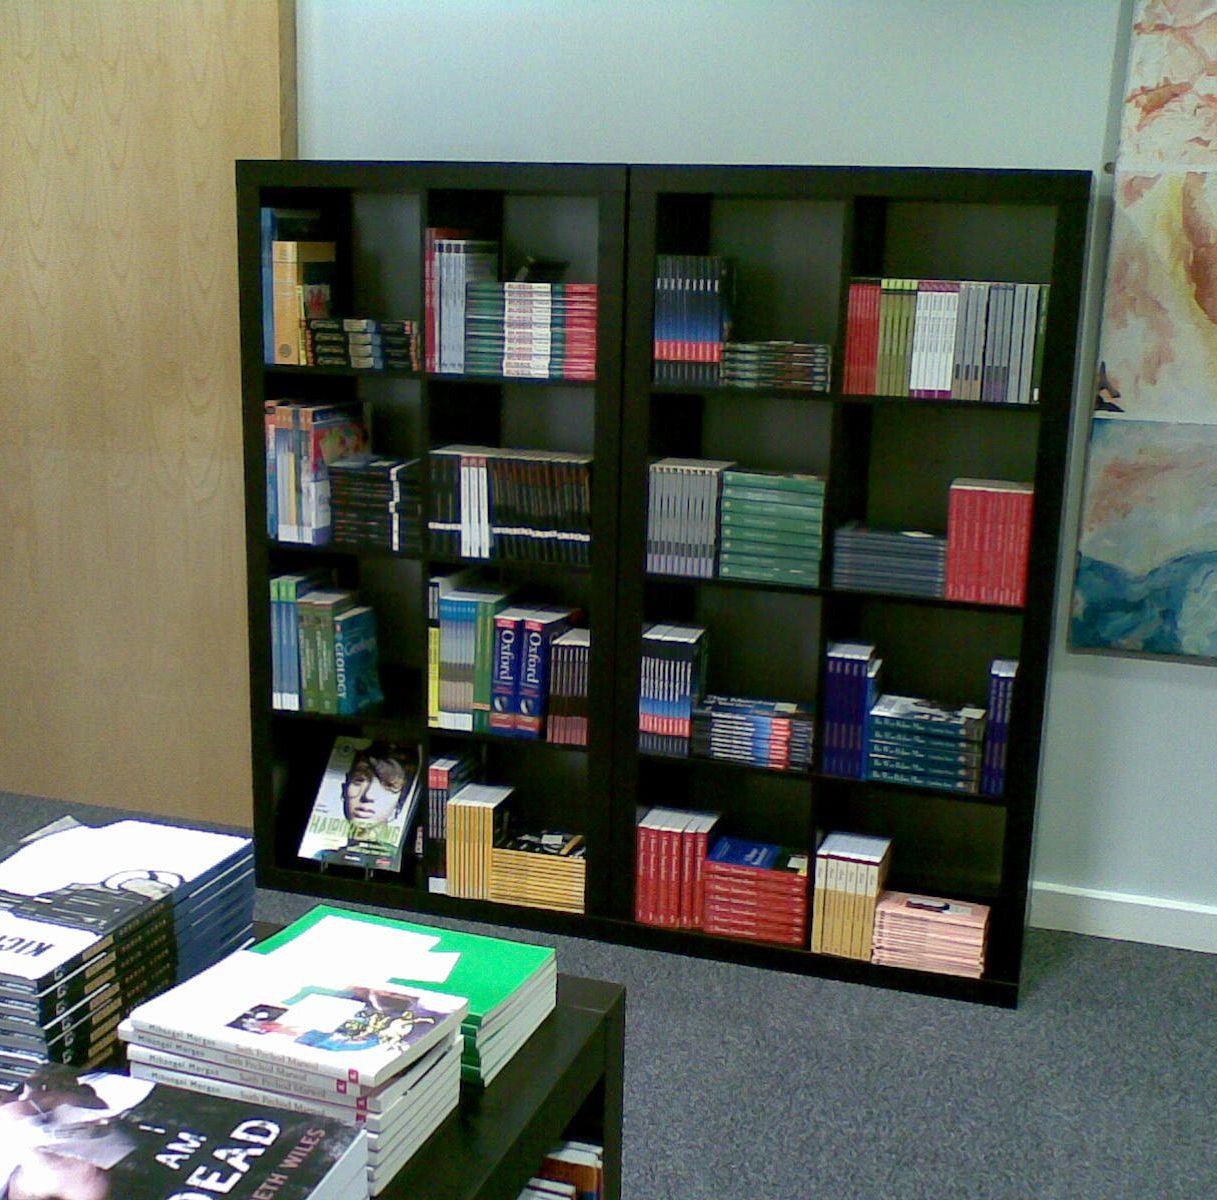 Libreria Per Libri Pesanti ripiani per libri vari - ripiani per libri vari - supereva